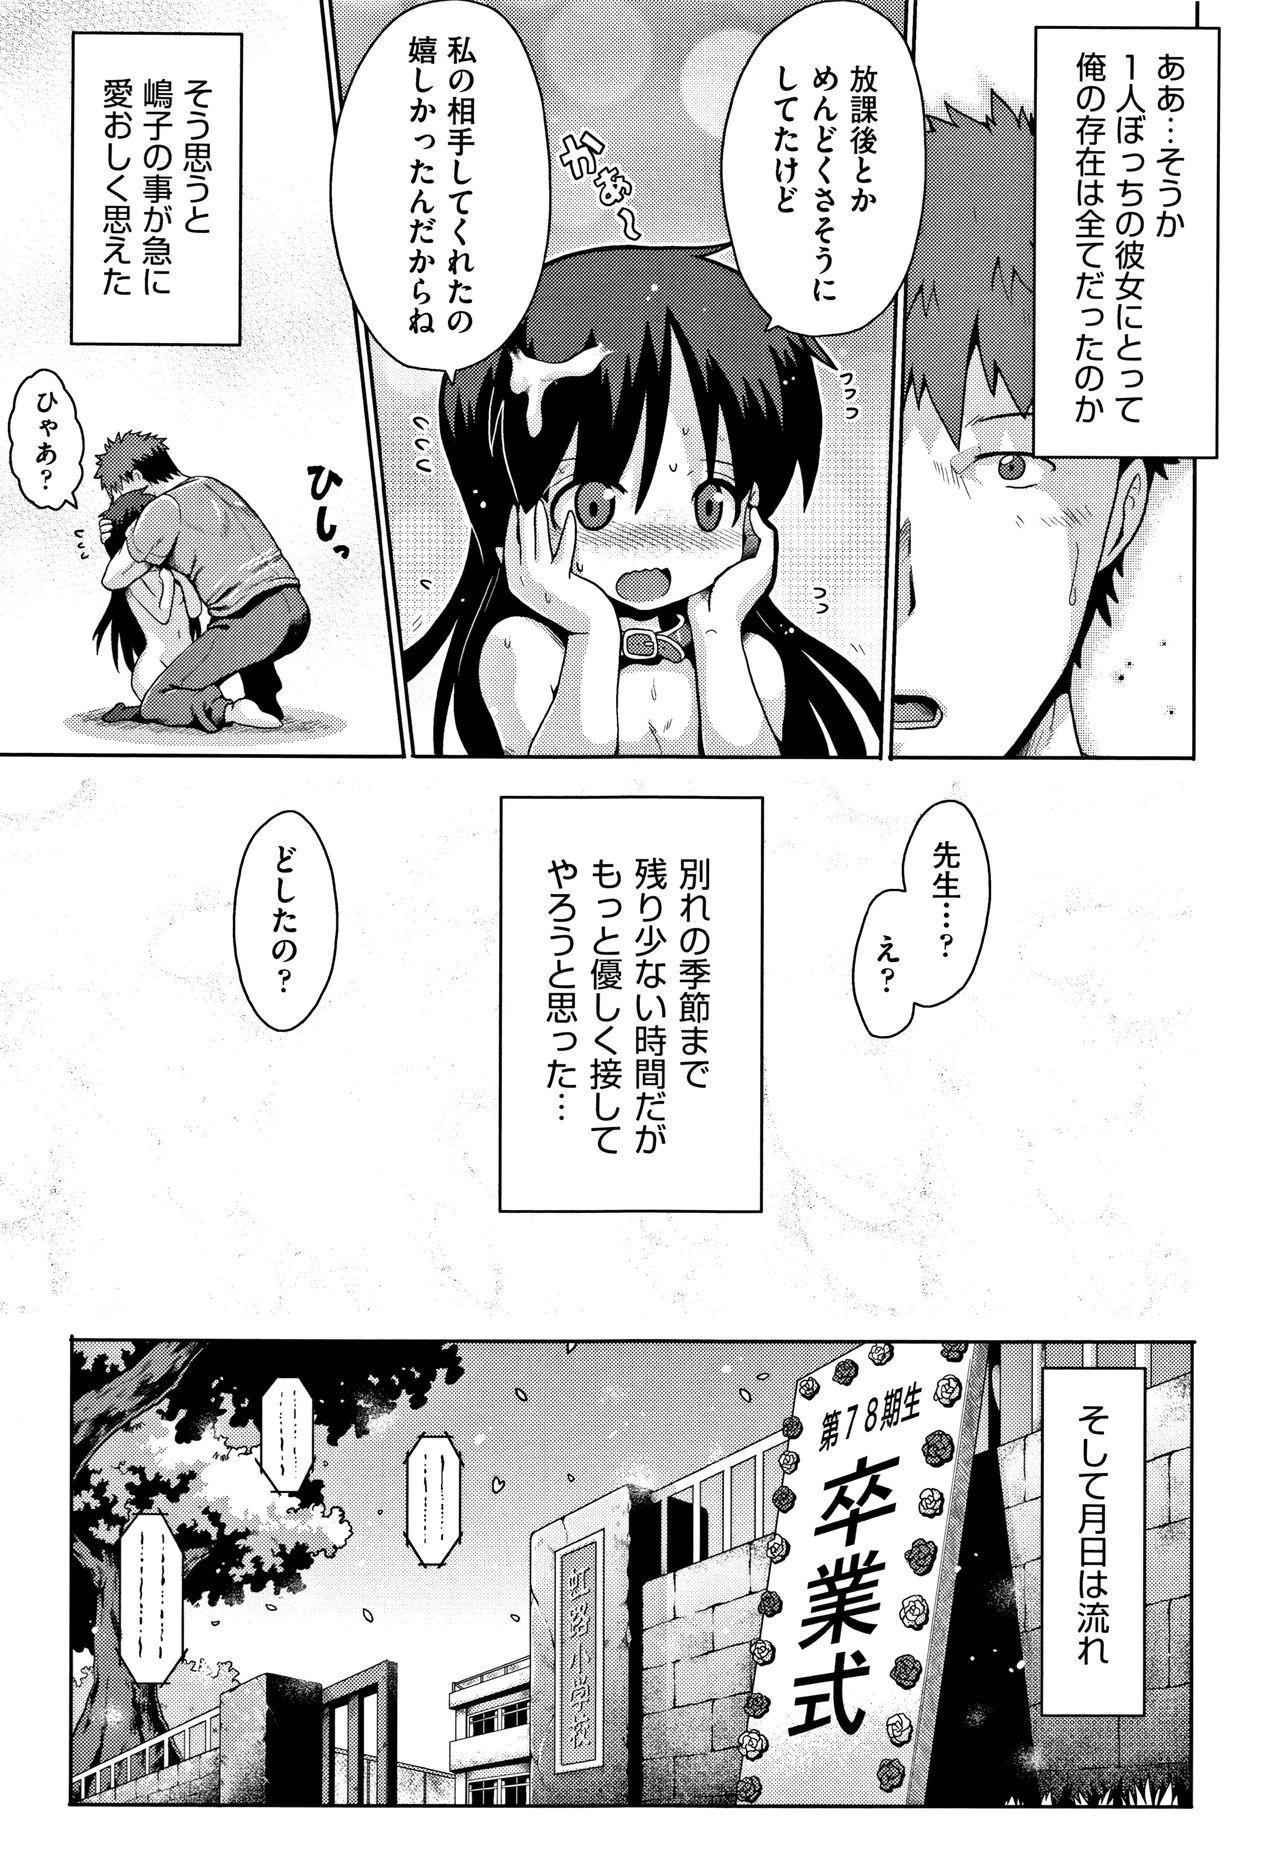 Kokugo Sansuu Rika Sex 117